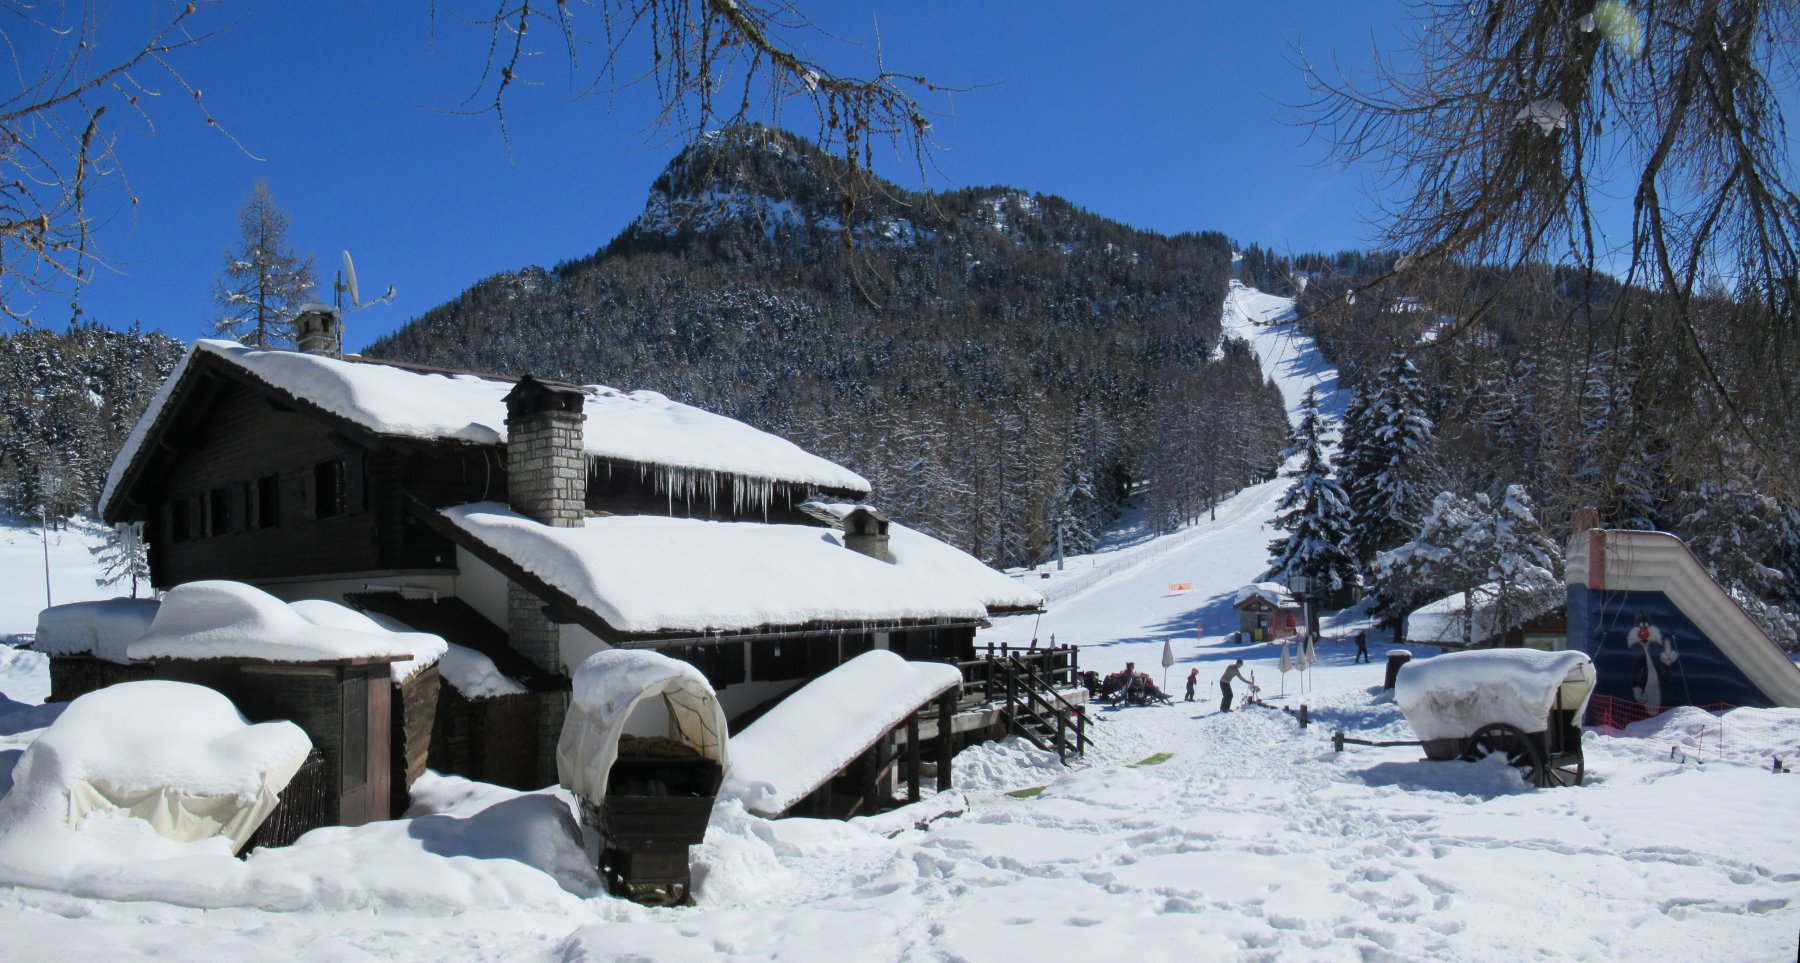 Hotel Etoile de Neige al Col de Joux